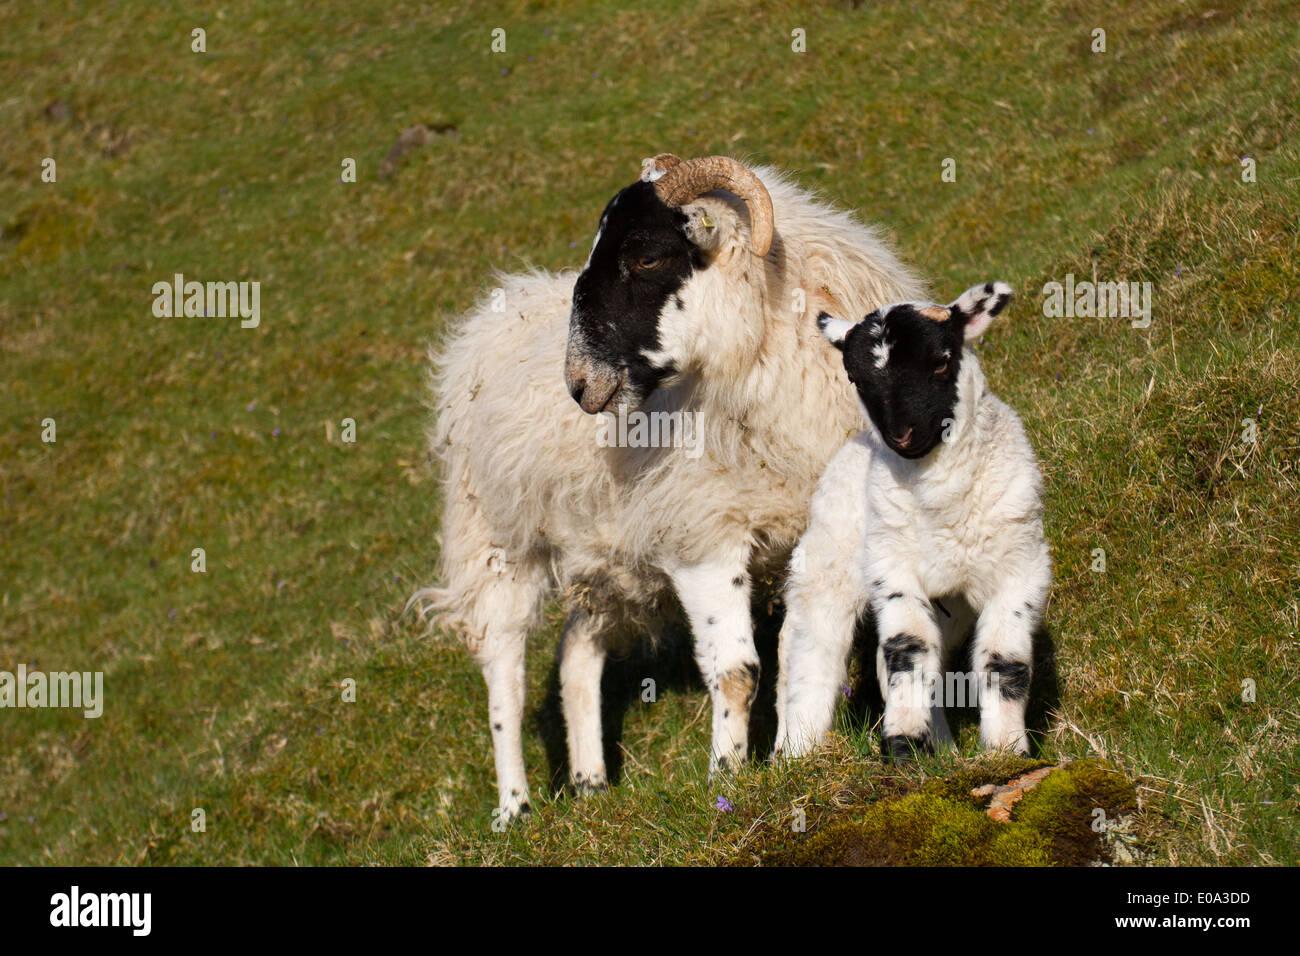 Black-faced Sheep ewe and lamb - Stock Image